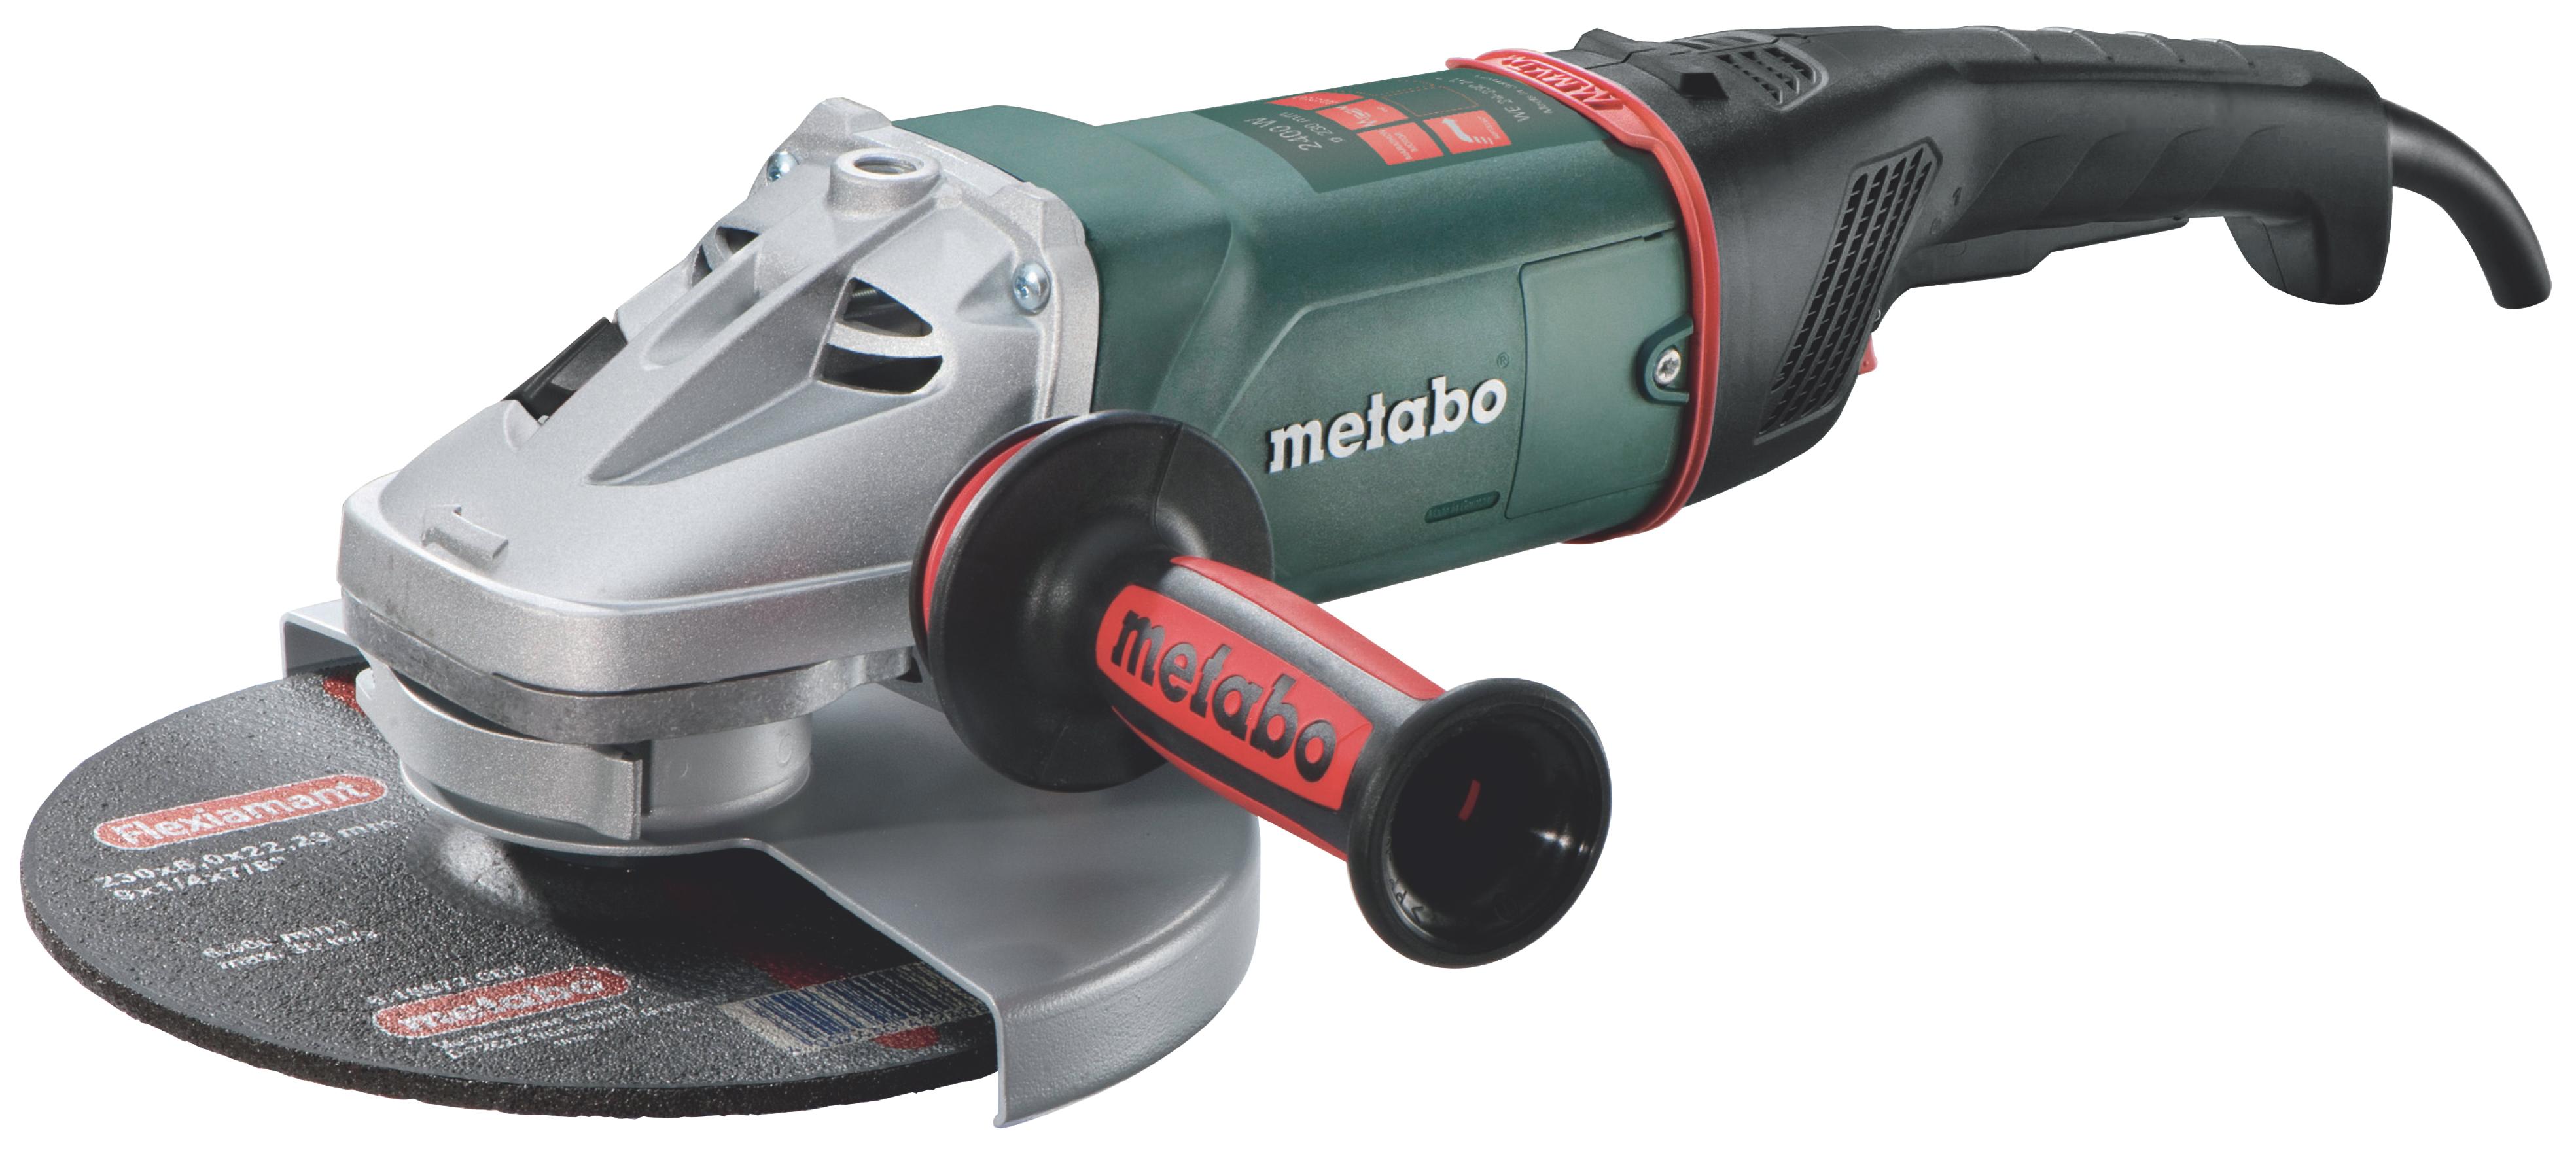 УШМ (болгарка) Metabo We 24-230 mvt (606469000) угловая шлифмашина metabo we 24 230 mvt 606469000